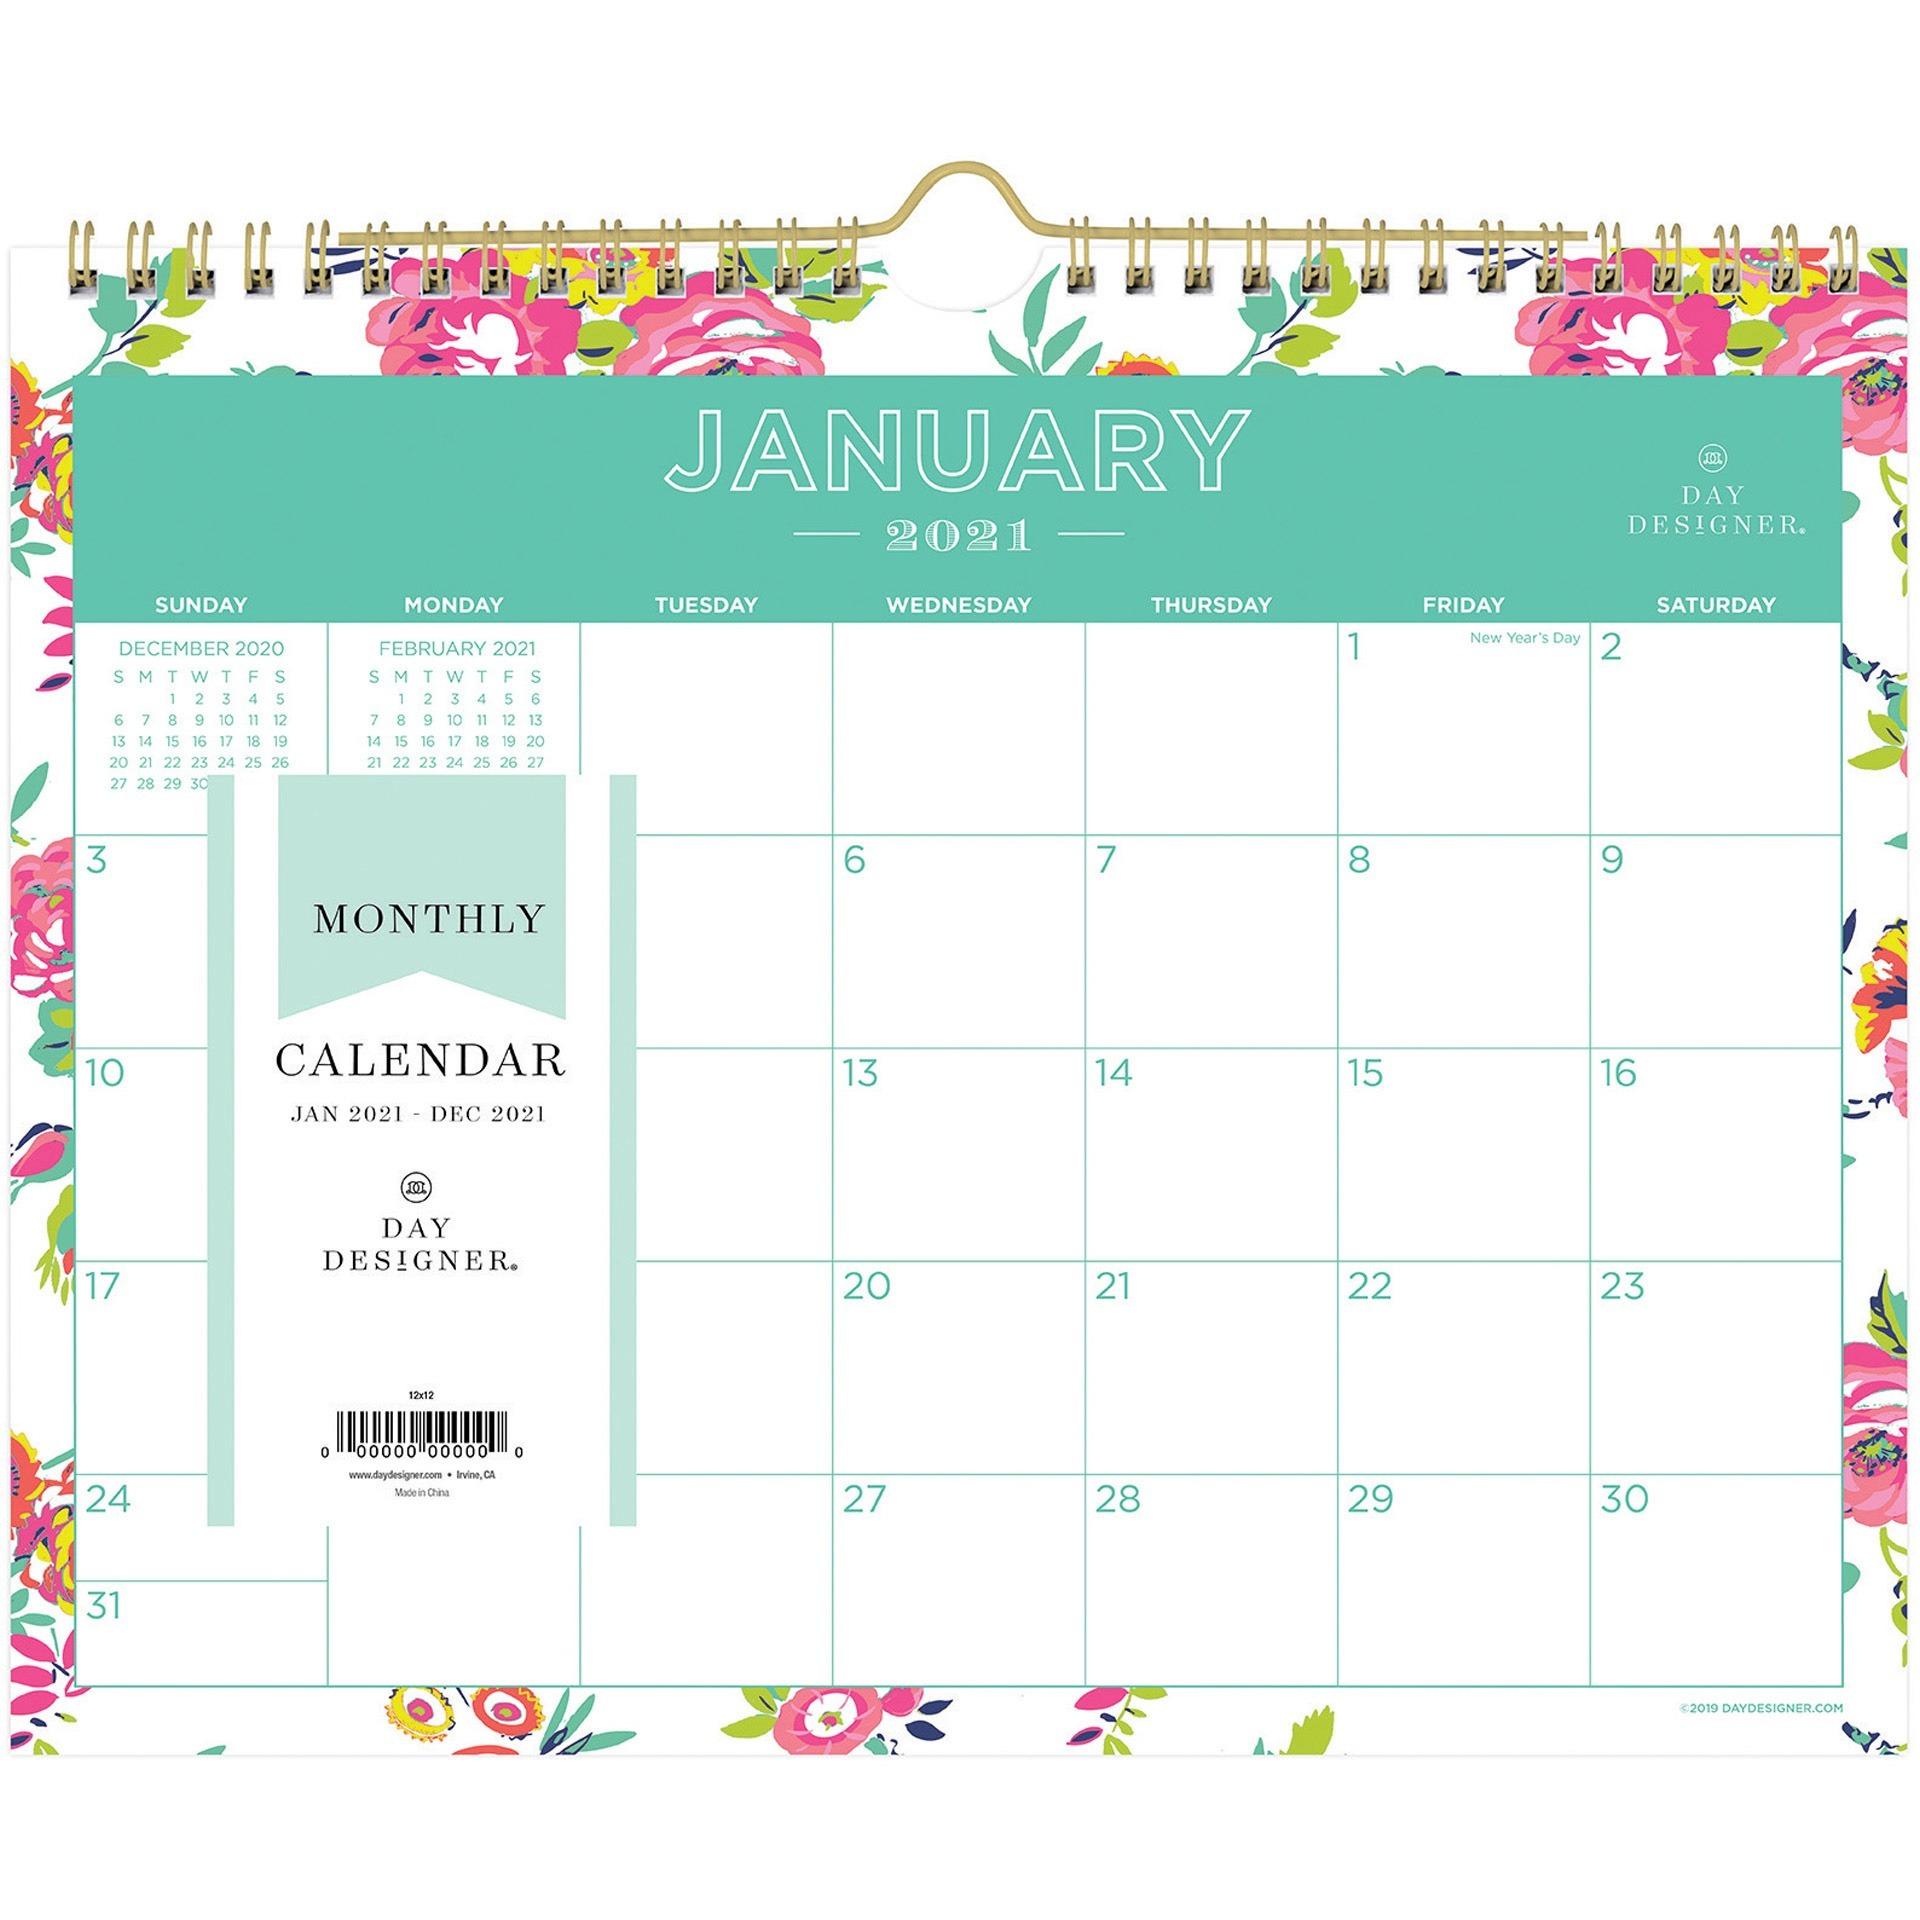 "Blue Sky Day Designer White Floral Wall Calendar - Julian Dates - Monthly -  1 Year - January 2021 Till December 2021 - 8 3/4"" X 11"" Sheet Size - Twin pertaining to Julian Date Calendar 2021"